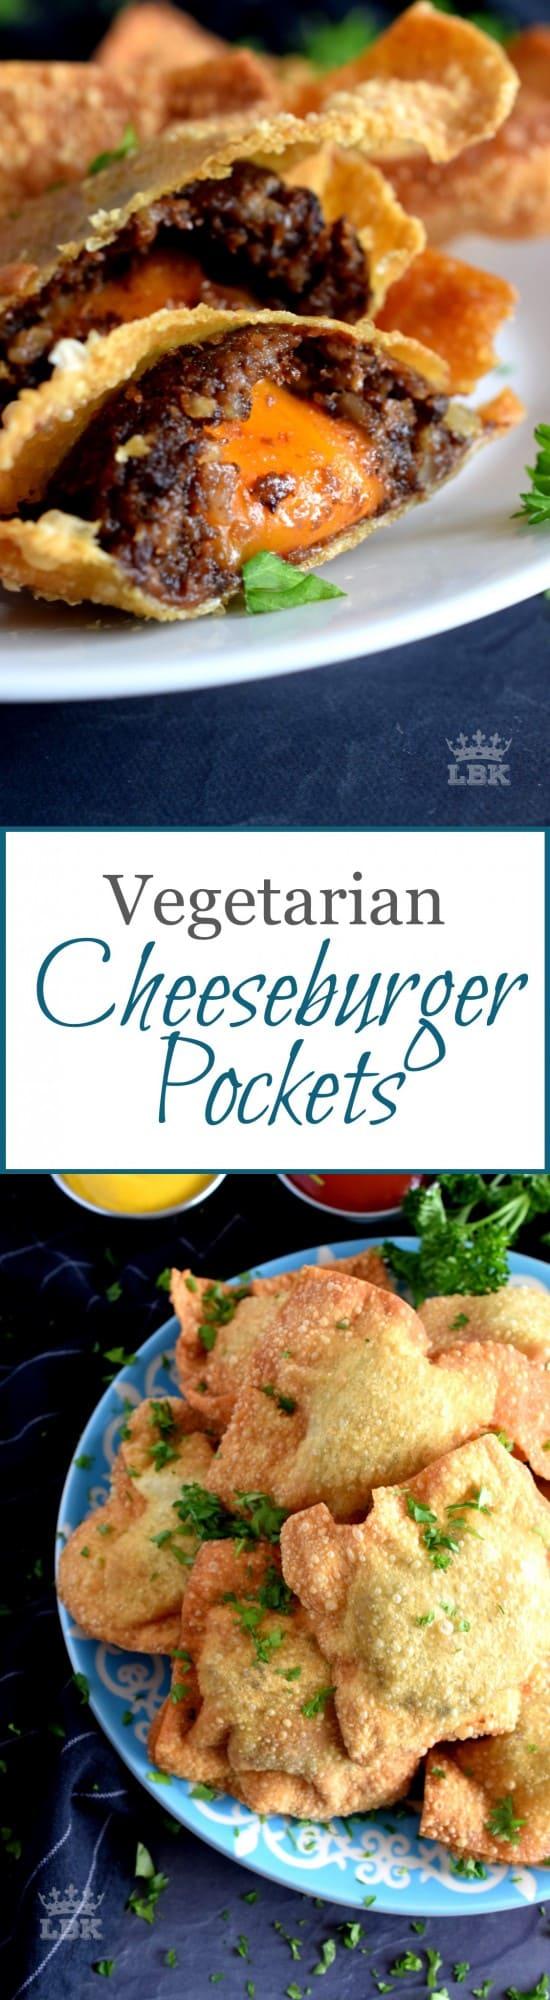 Fried Vegetarian Cheeseburger Pockets